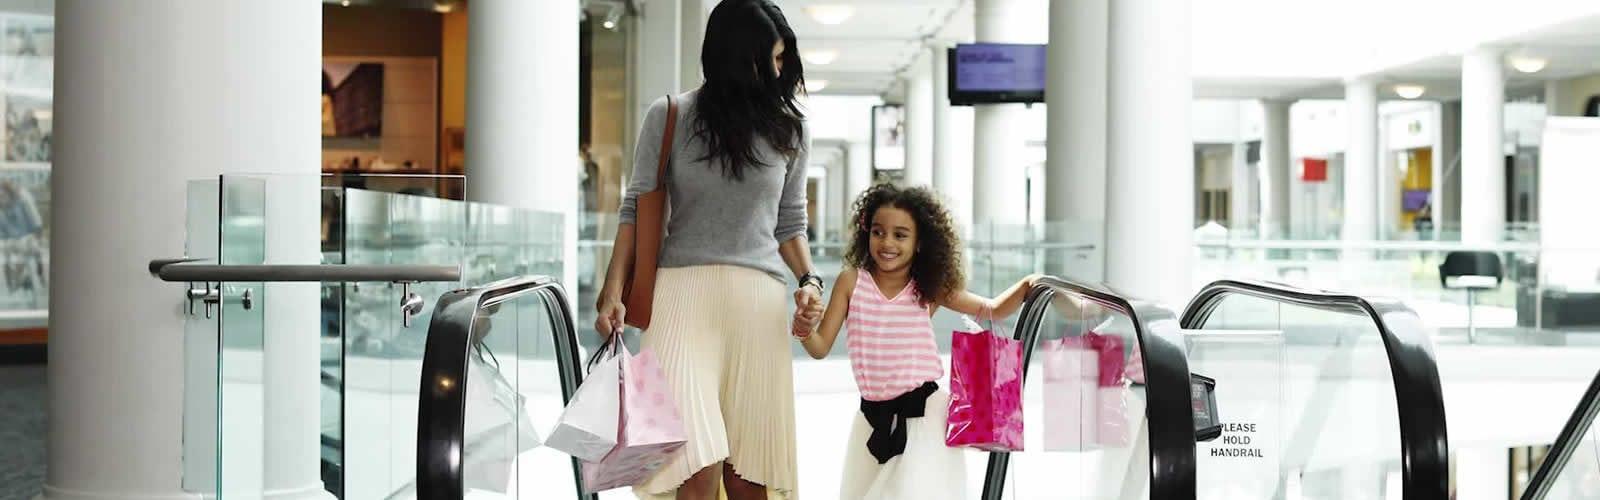 malls-shopping-miami-centre-commercial-une-2